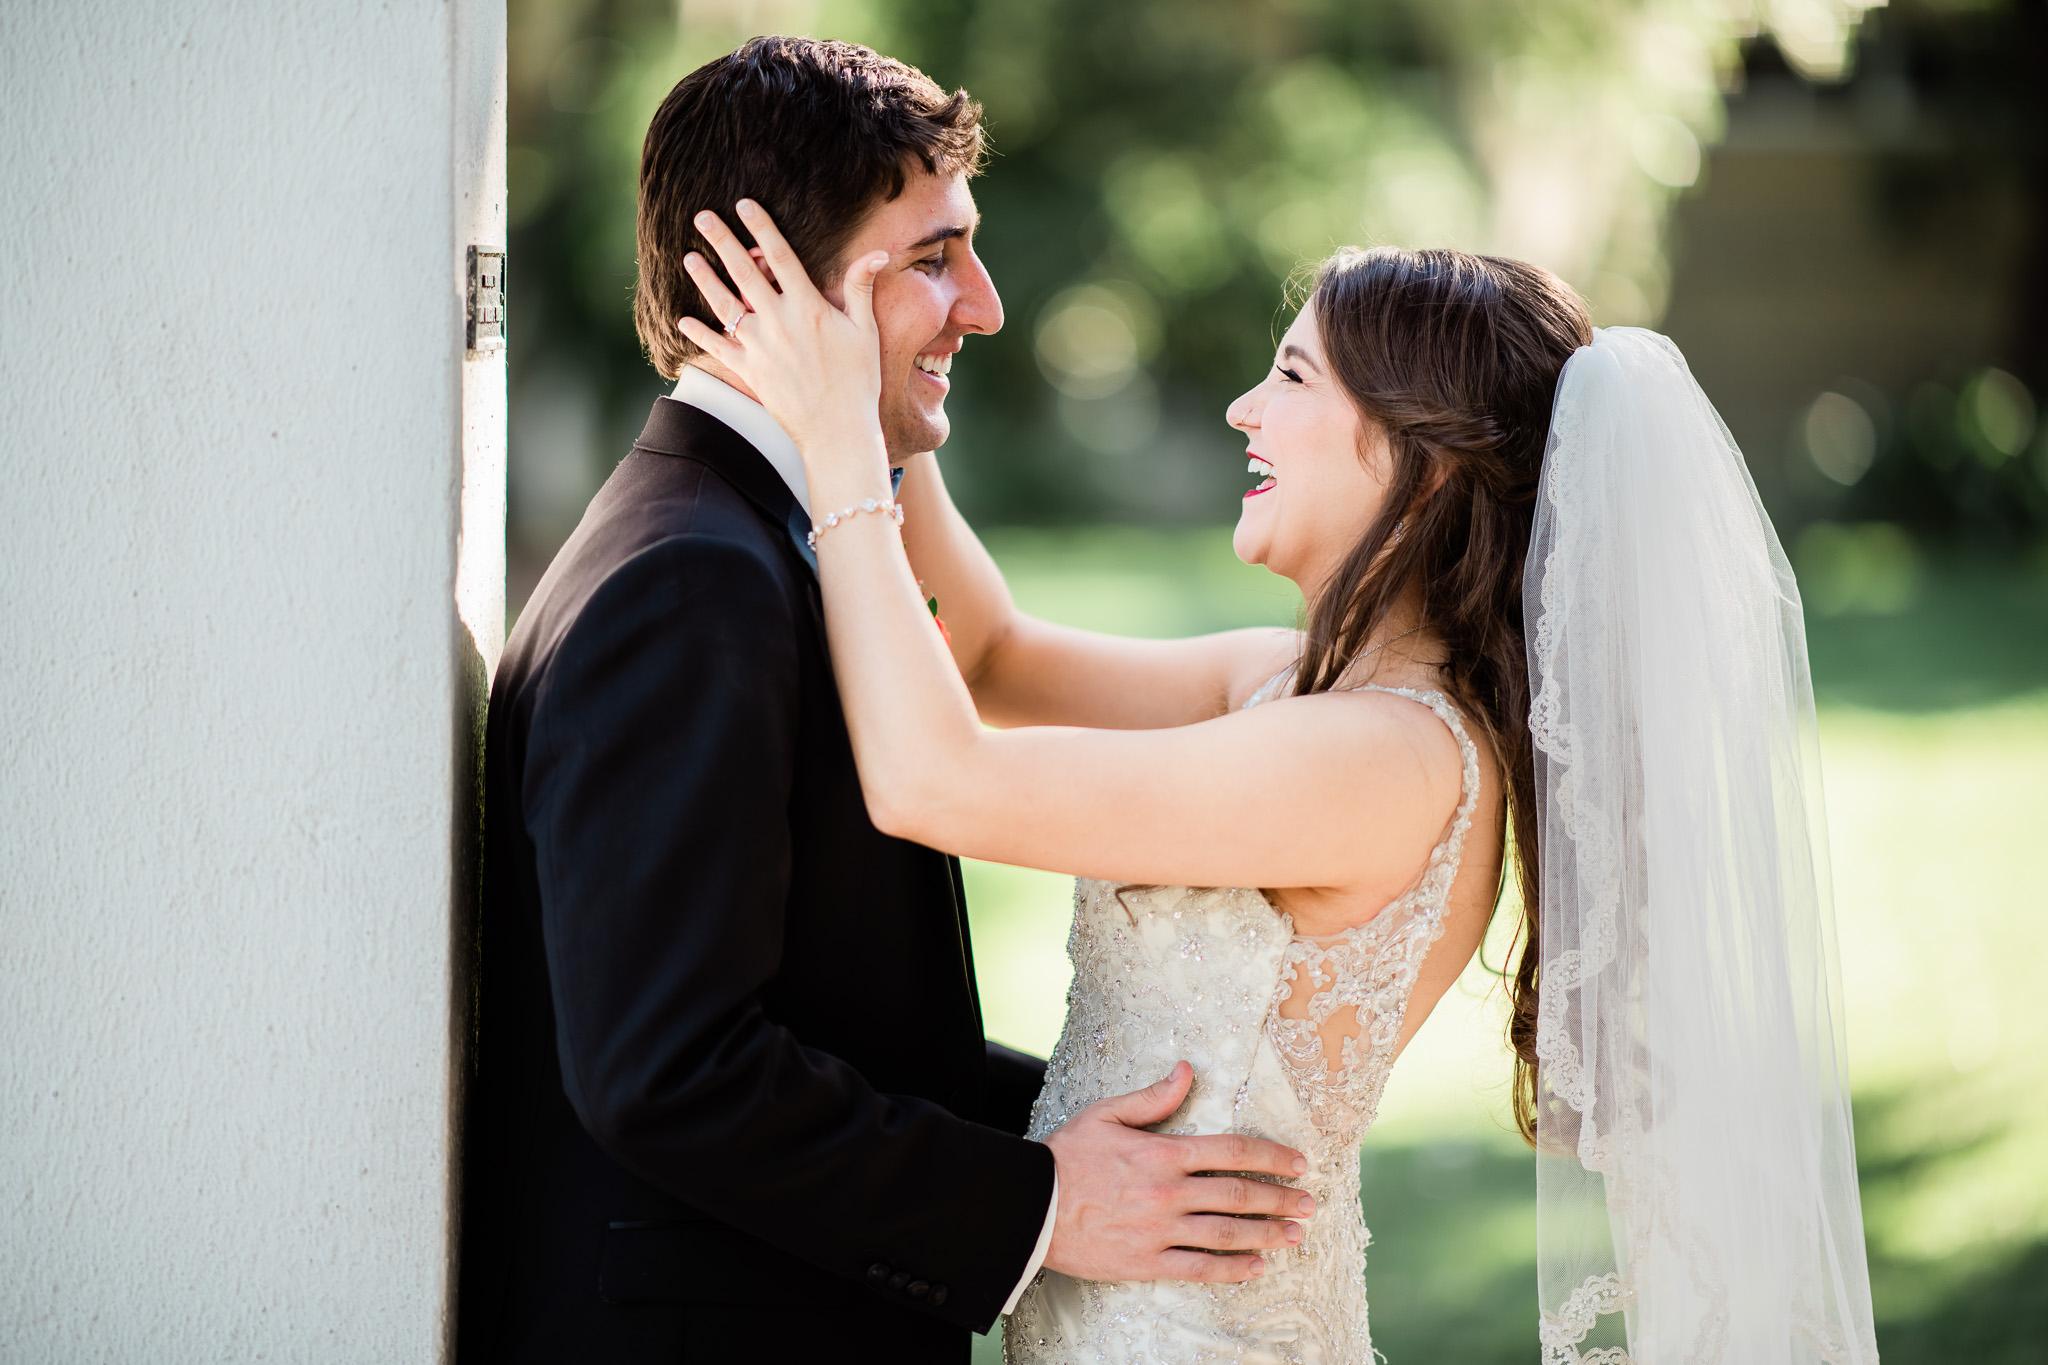 TAMPA_WEDDING_PHOTOGRAPHER_MPMZ_D82_2611_0069.jpg